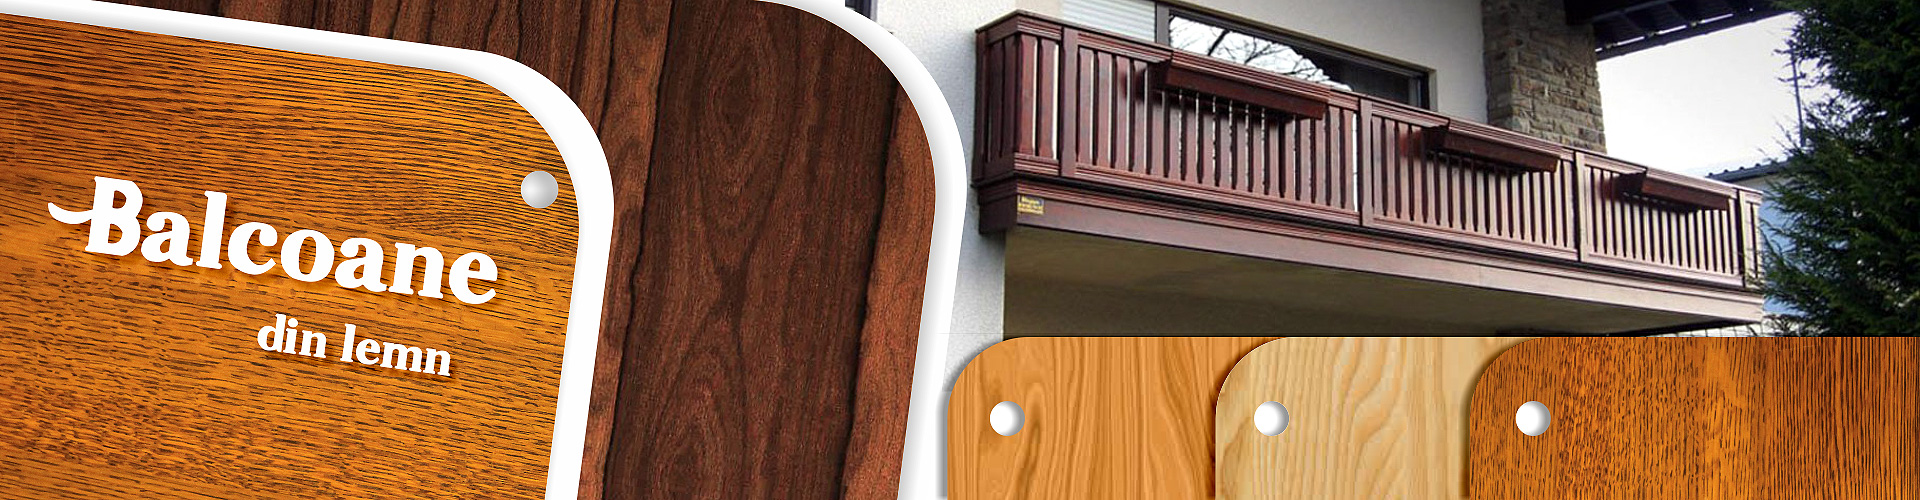 balcoane din lemn